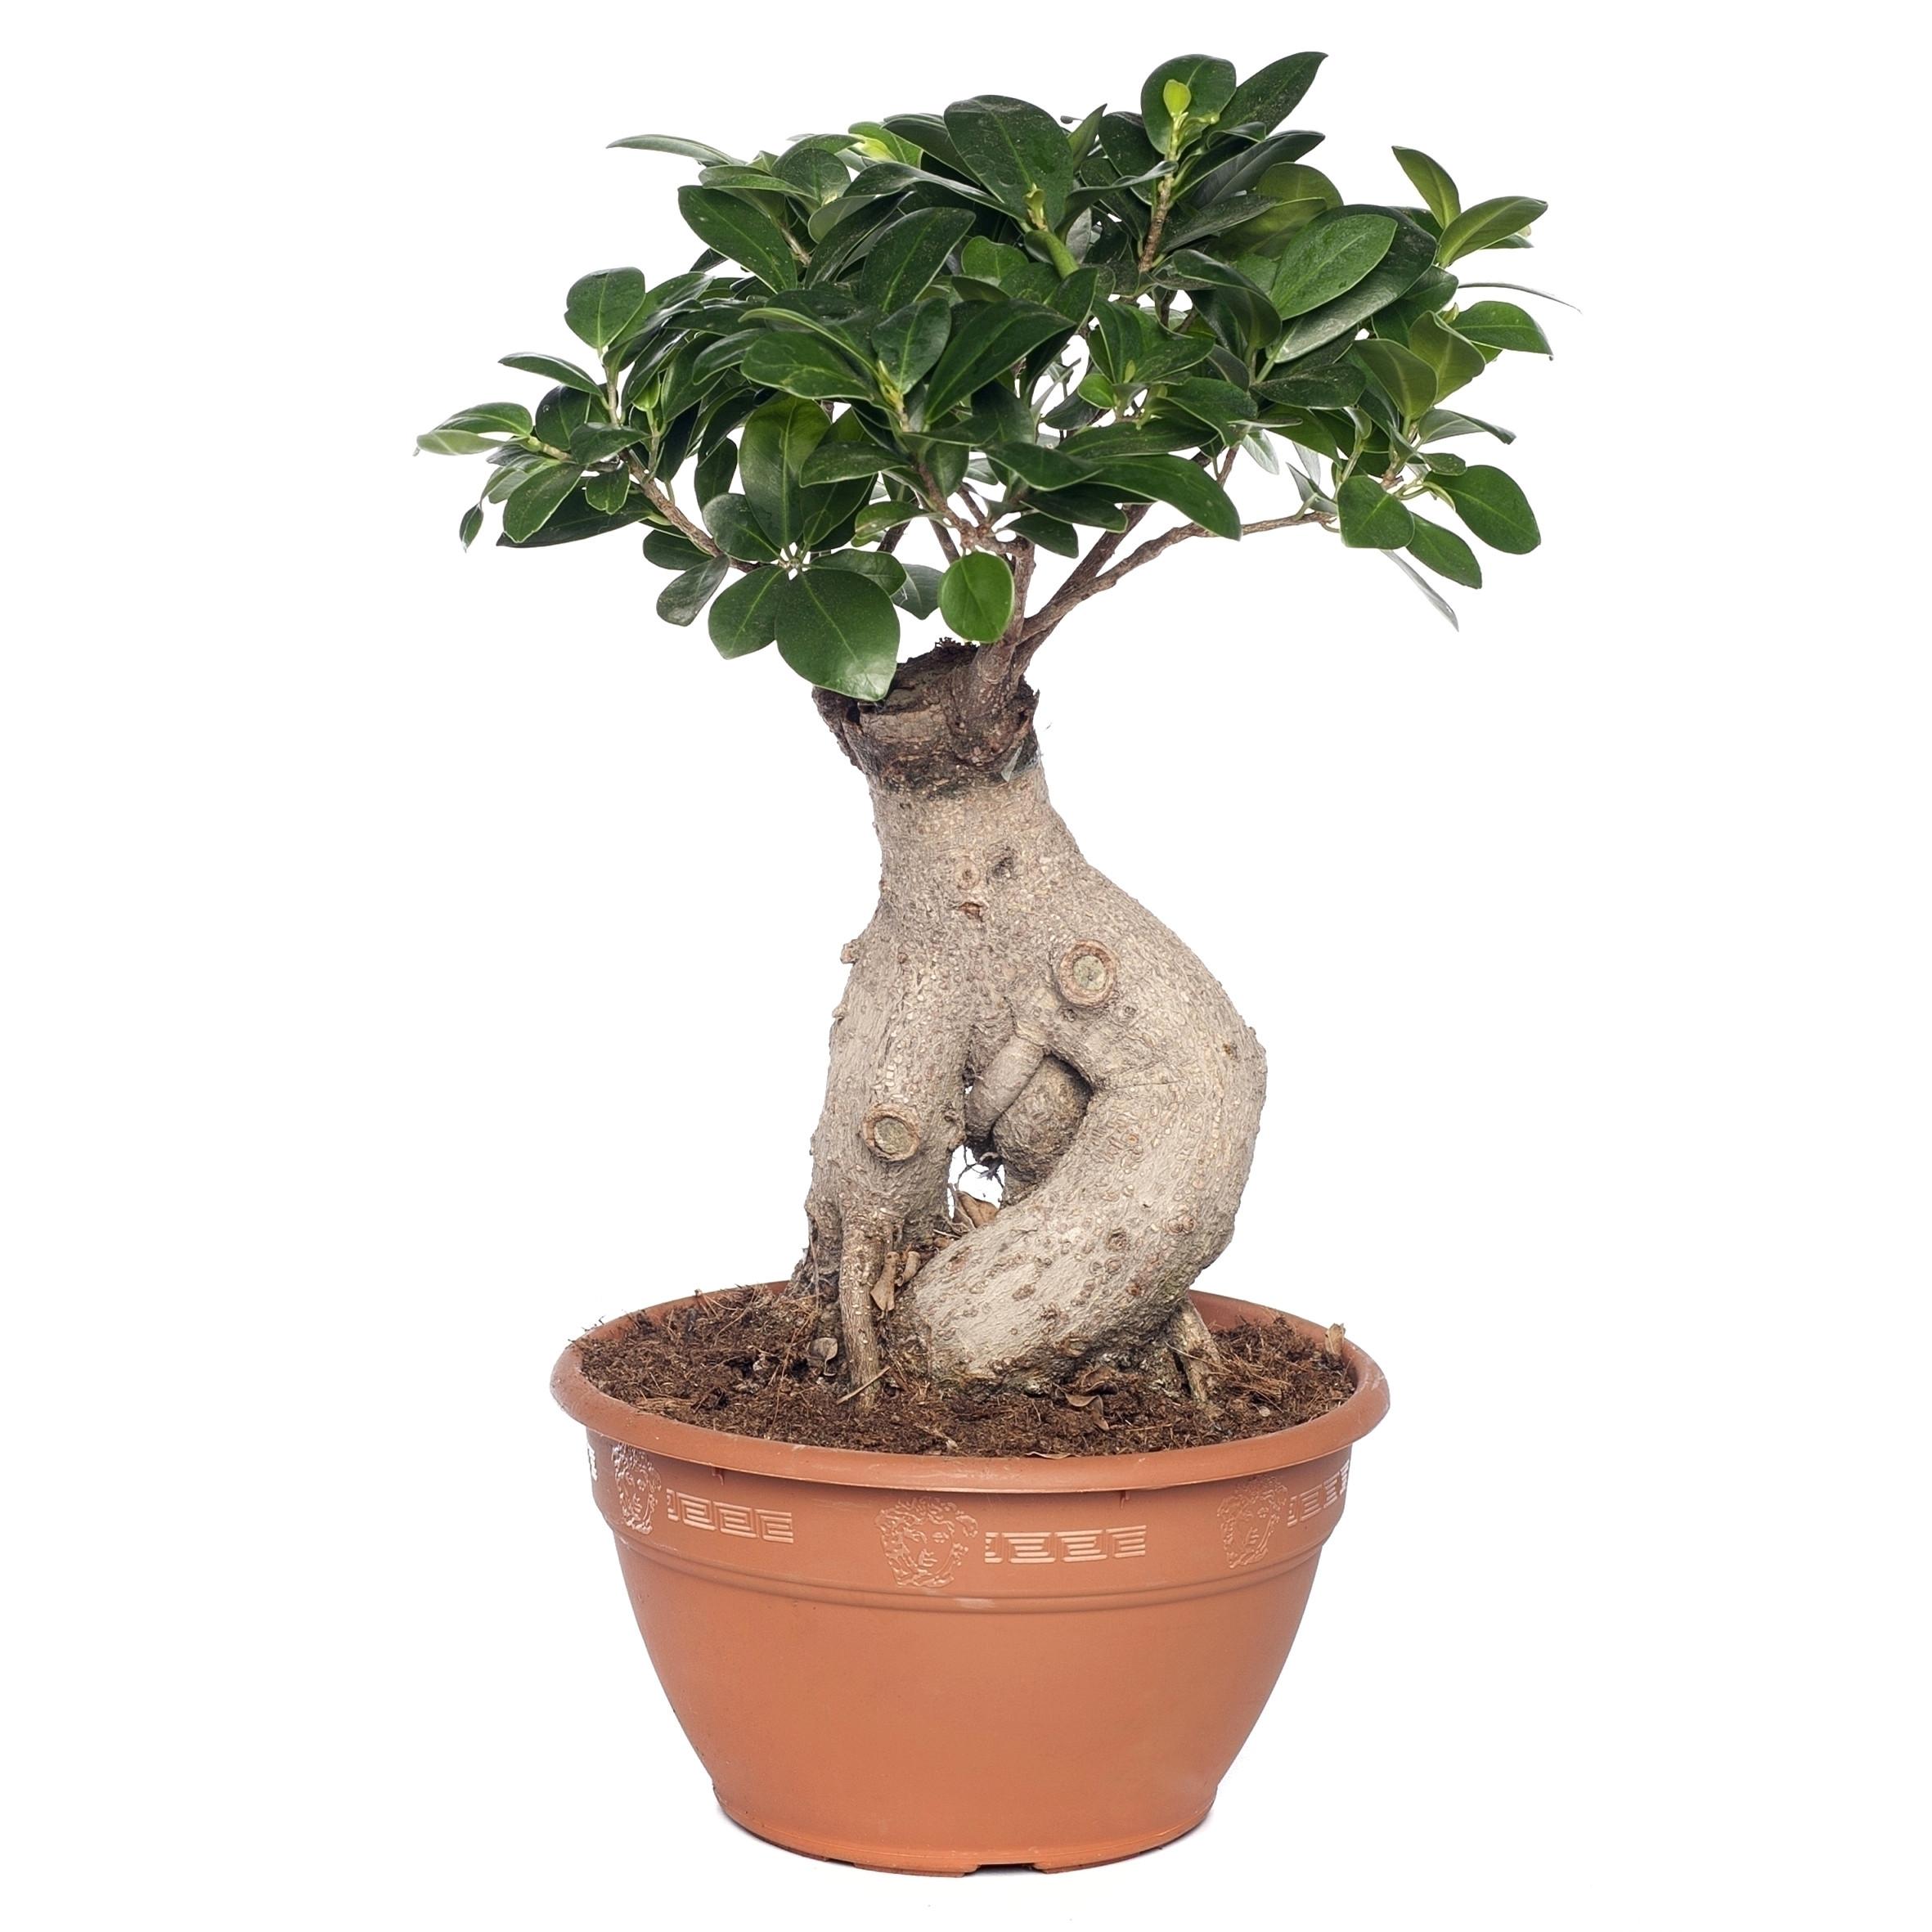 Care Of Ficus Microcarpa Ginseng Ficus Microcarpa Ginseng Pflege Genial 29 Pflege Ficus Ginseng